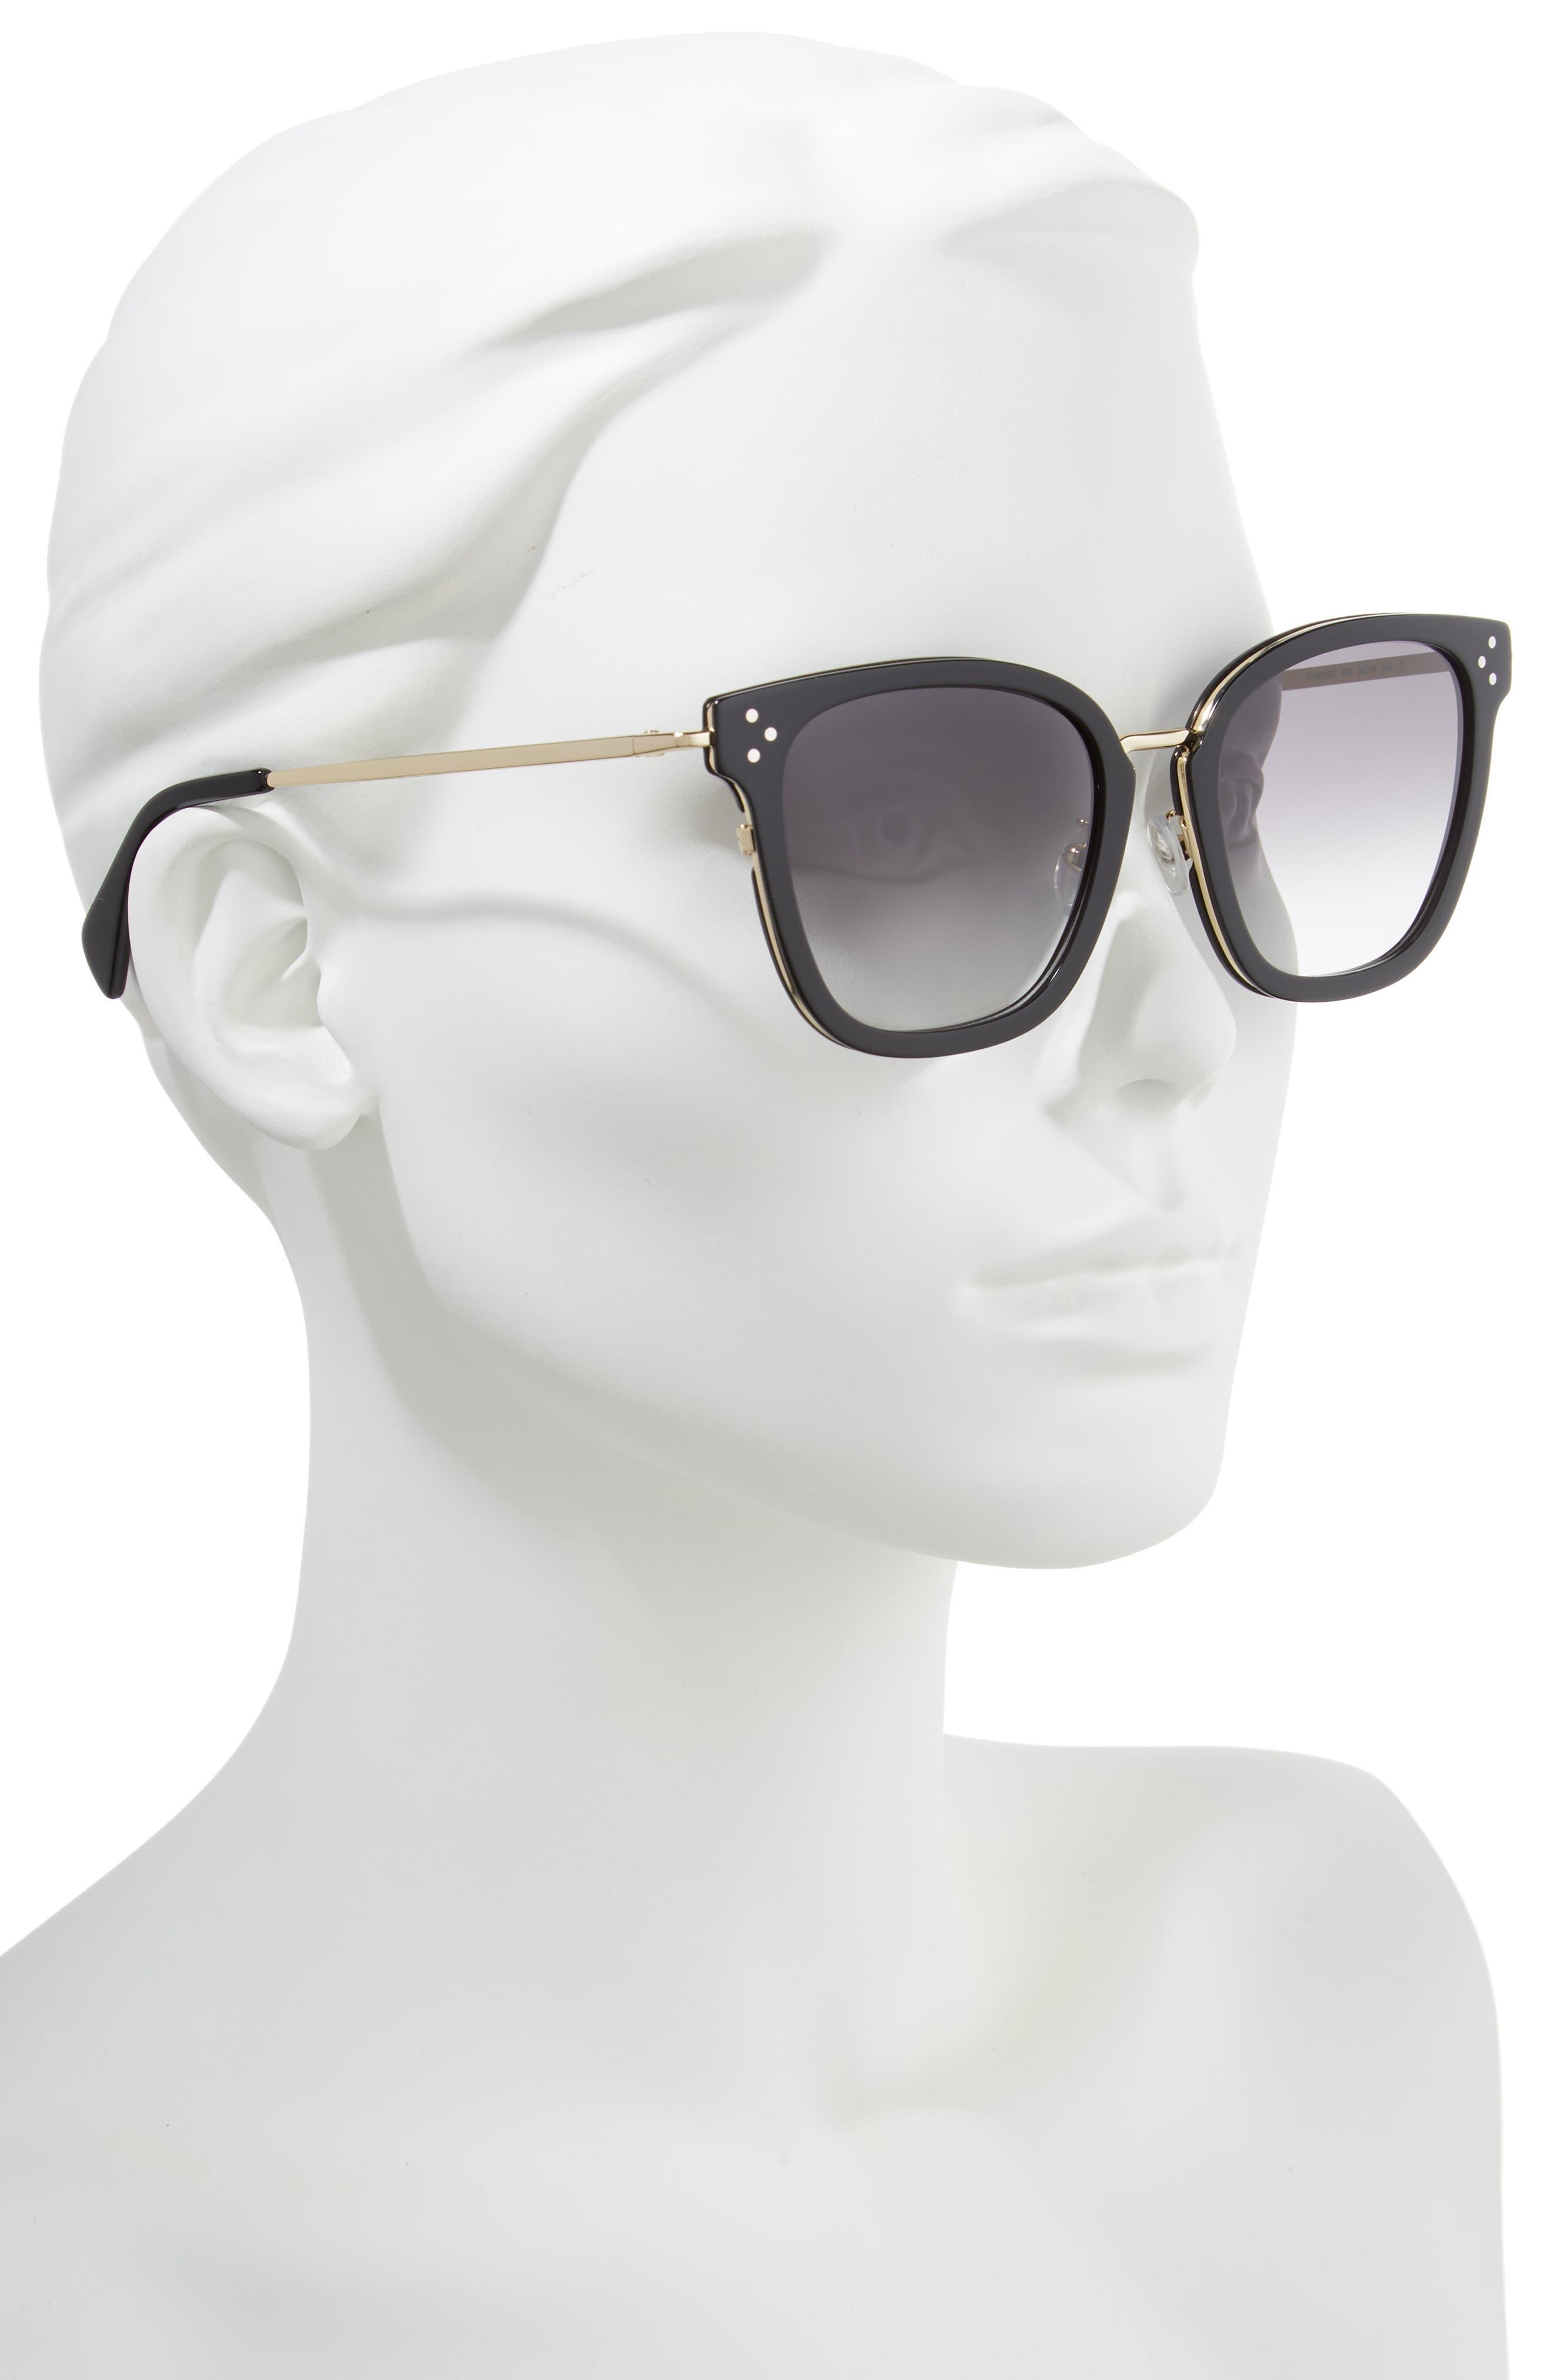 CELINE,                             Special Fit 54mm Sunglasses,                             Alternate thumbnail 2, color,                             BLACK/ GOLD/ SMOKE